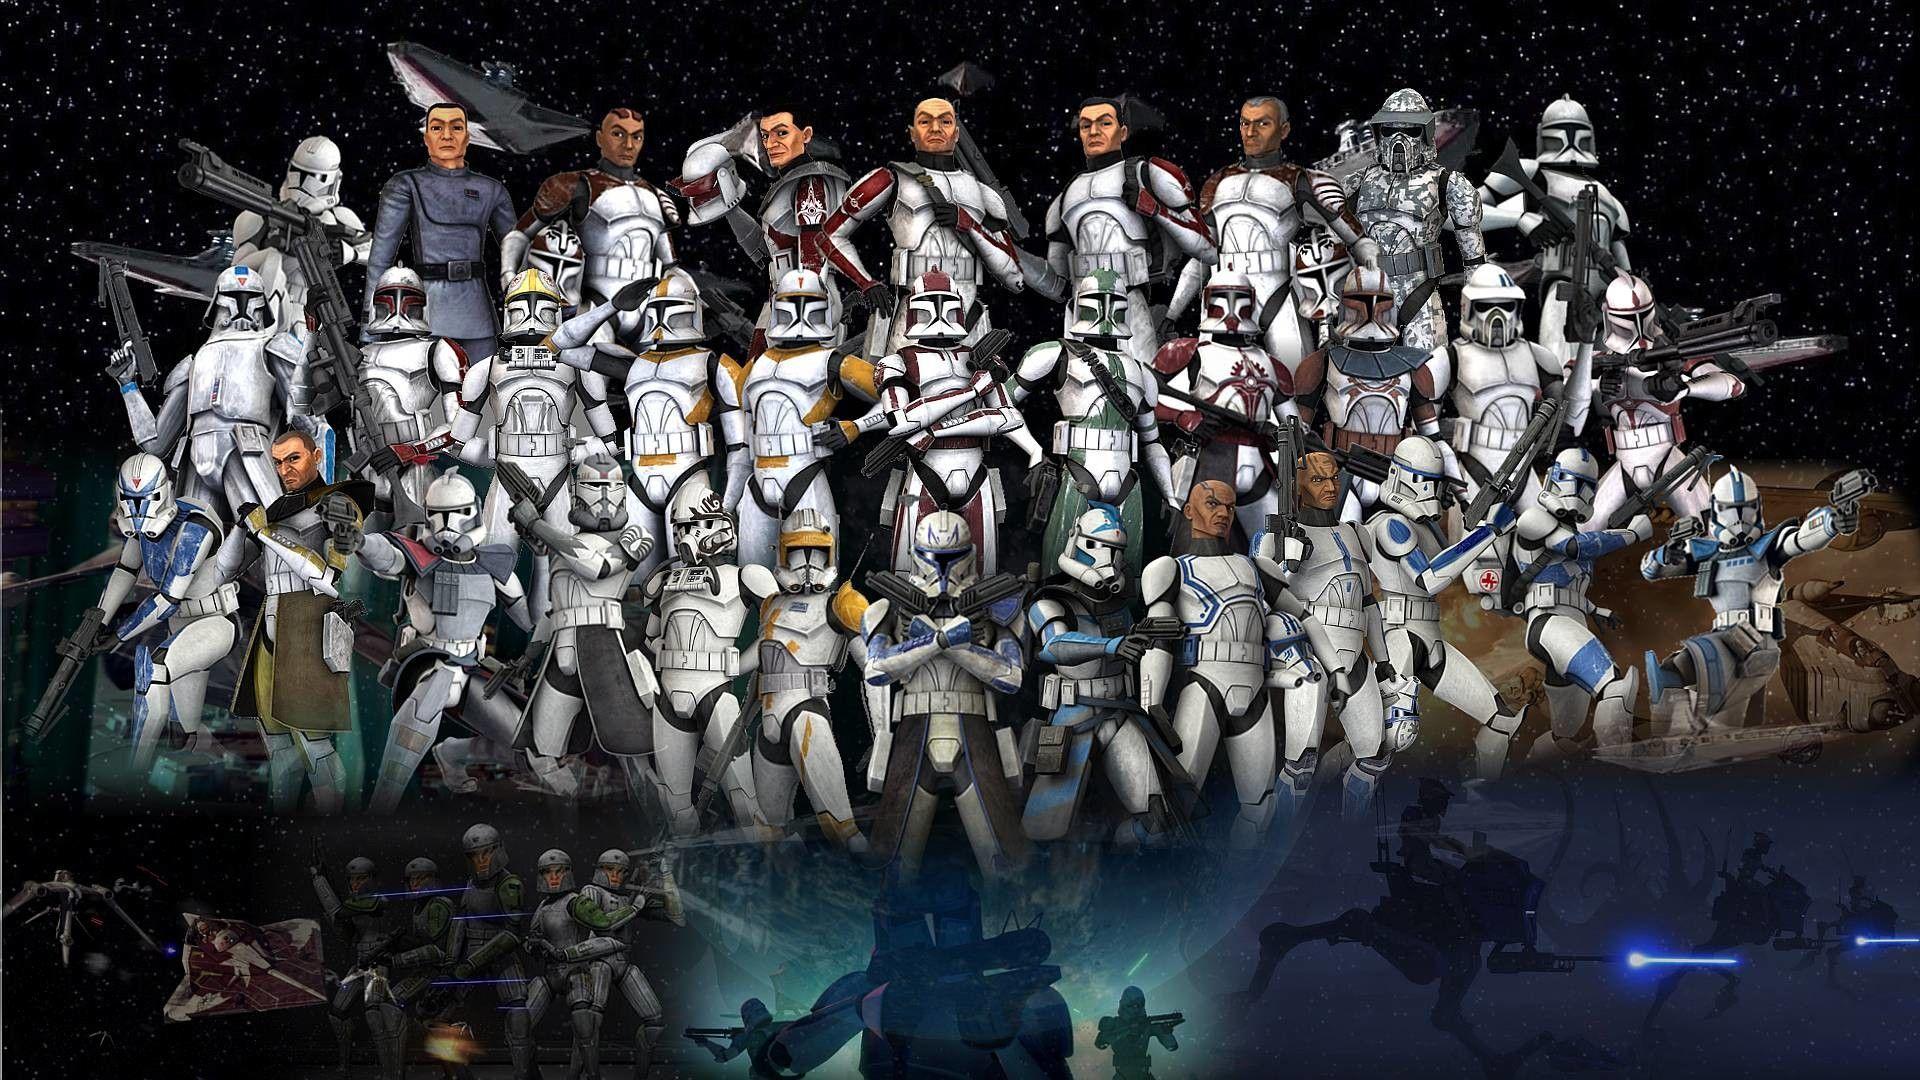 Star Wars The Clone Wars Desktop Wallpapers Top Free Star Wars The Clone Wars Desktop Backgrounds Wallpaperaccess